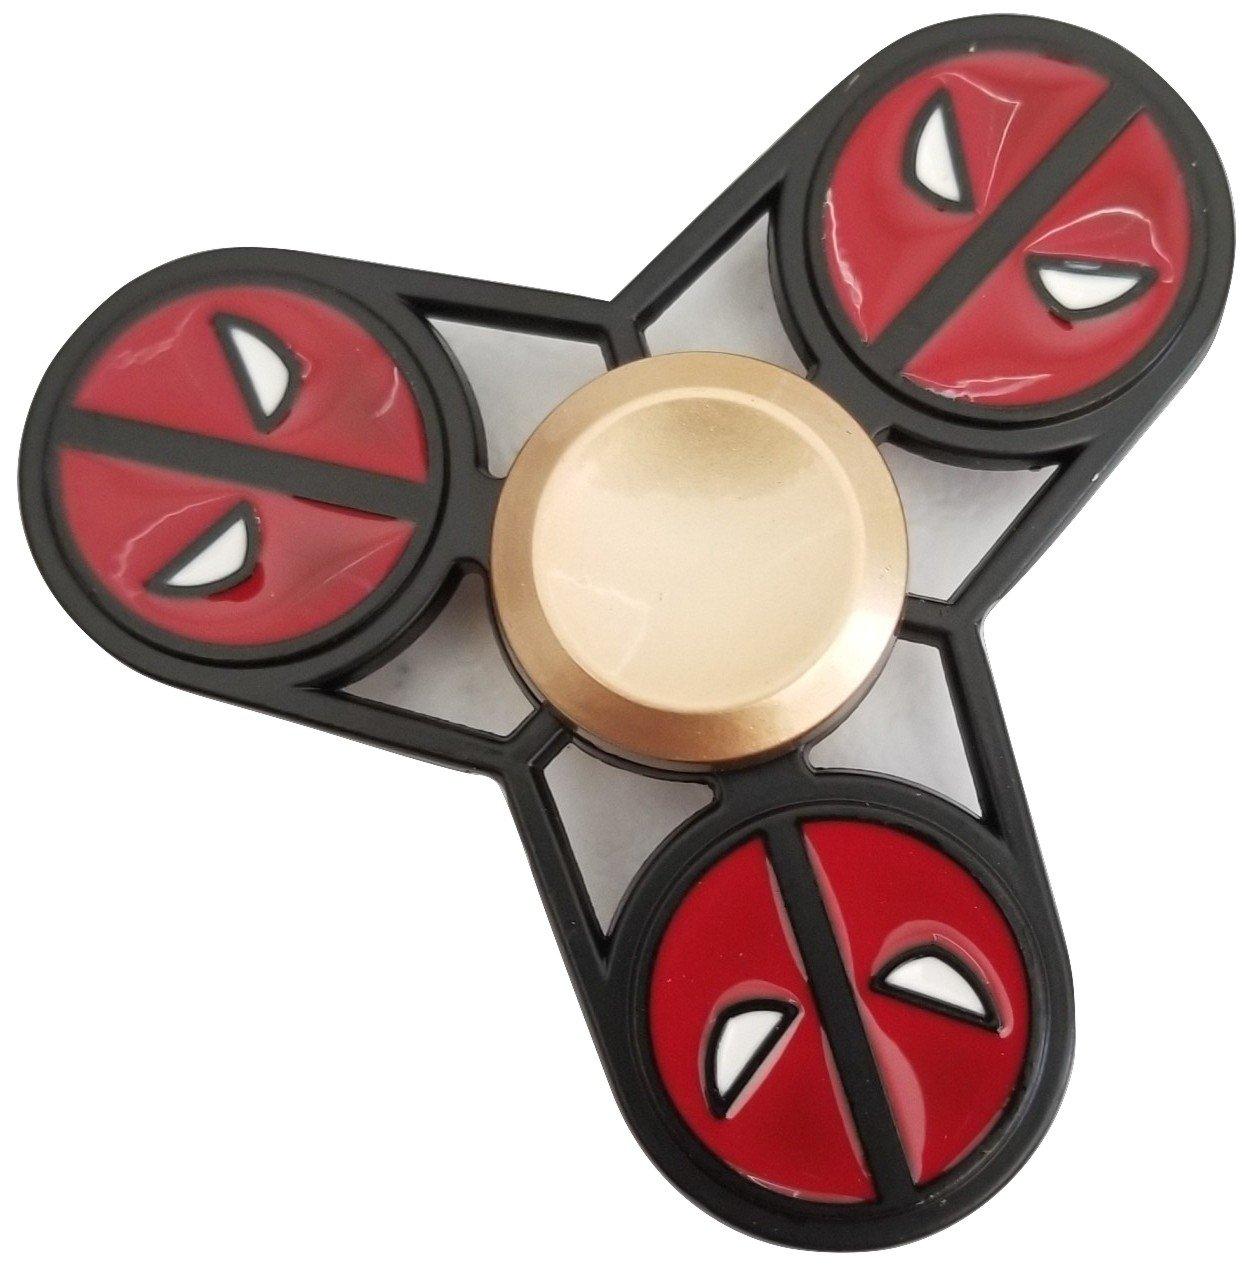 Metal Fidget Spinner Relieve Stress Reduce Anxiety Deadpool Spinner Toy dp2